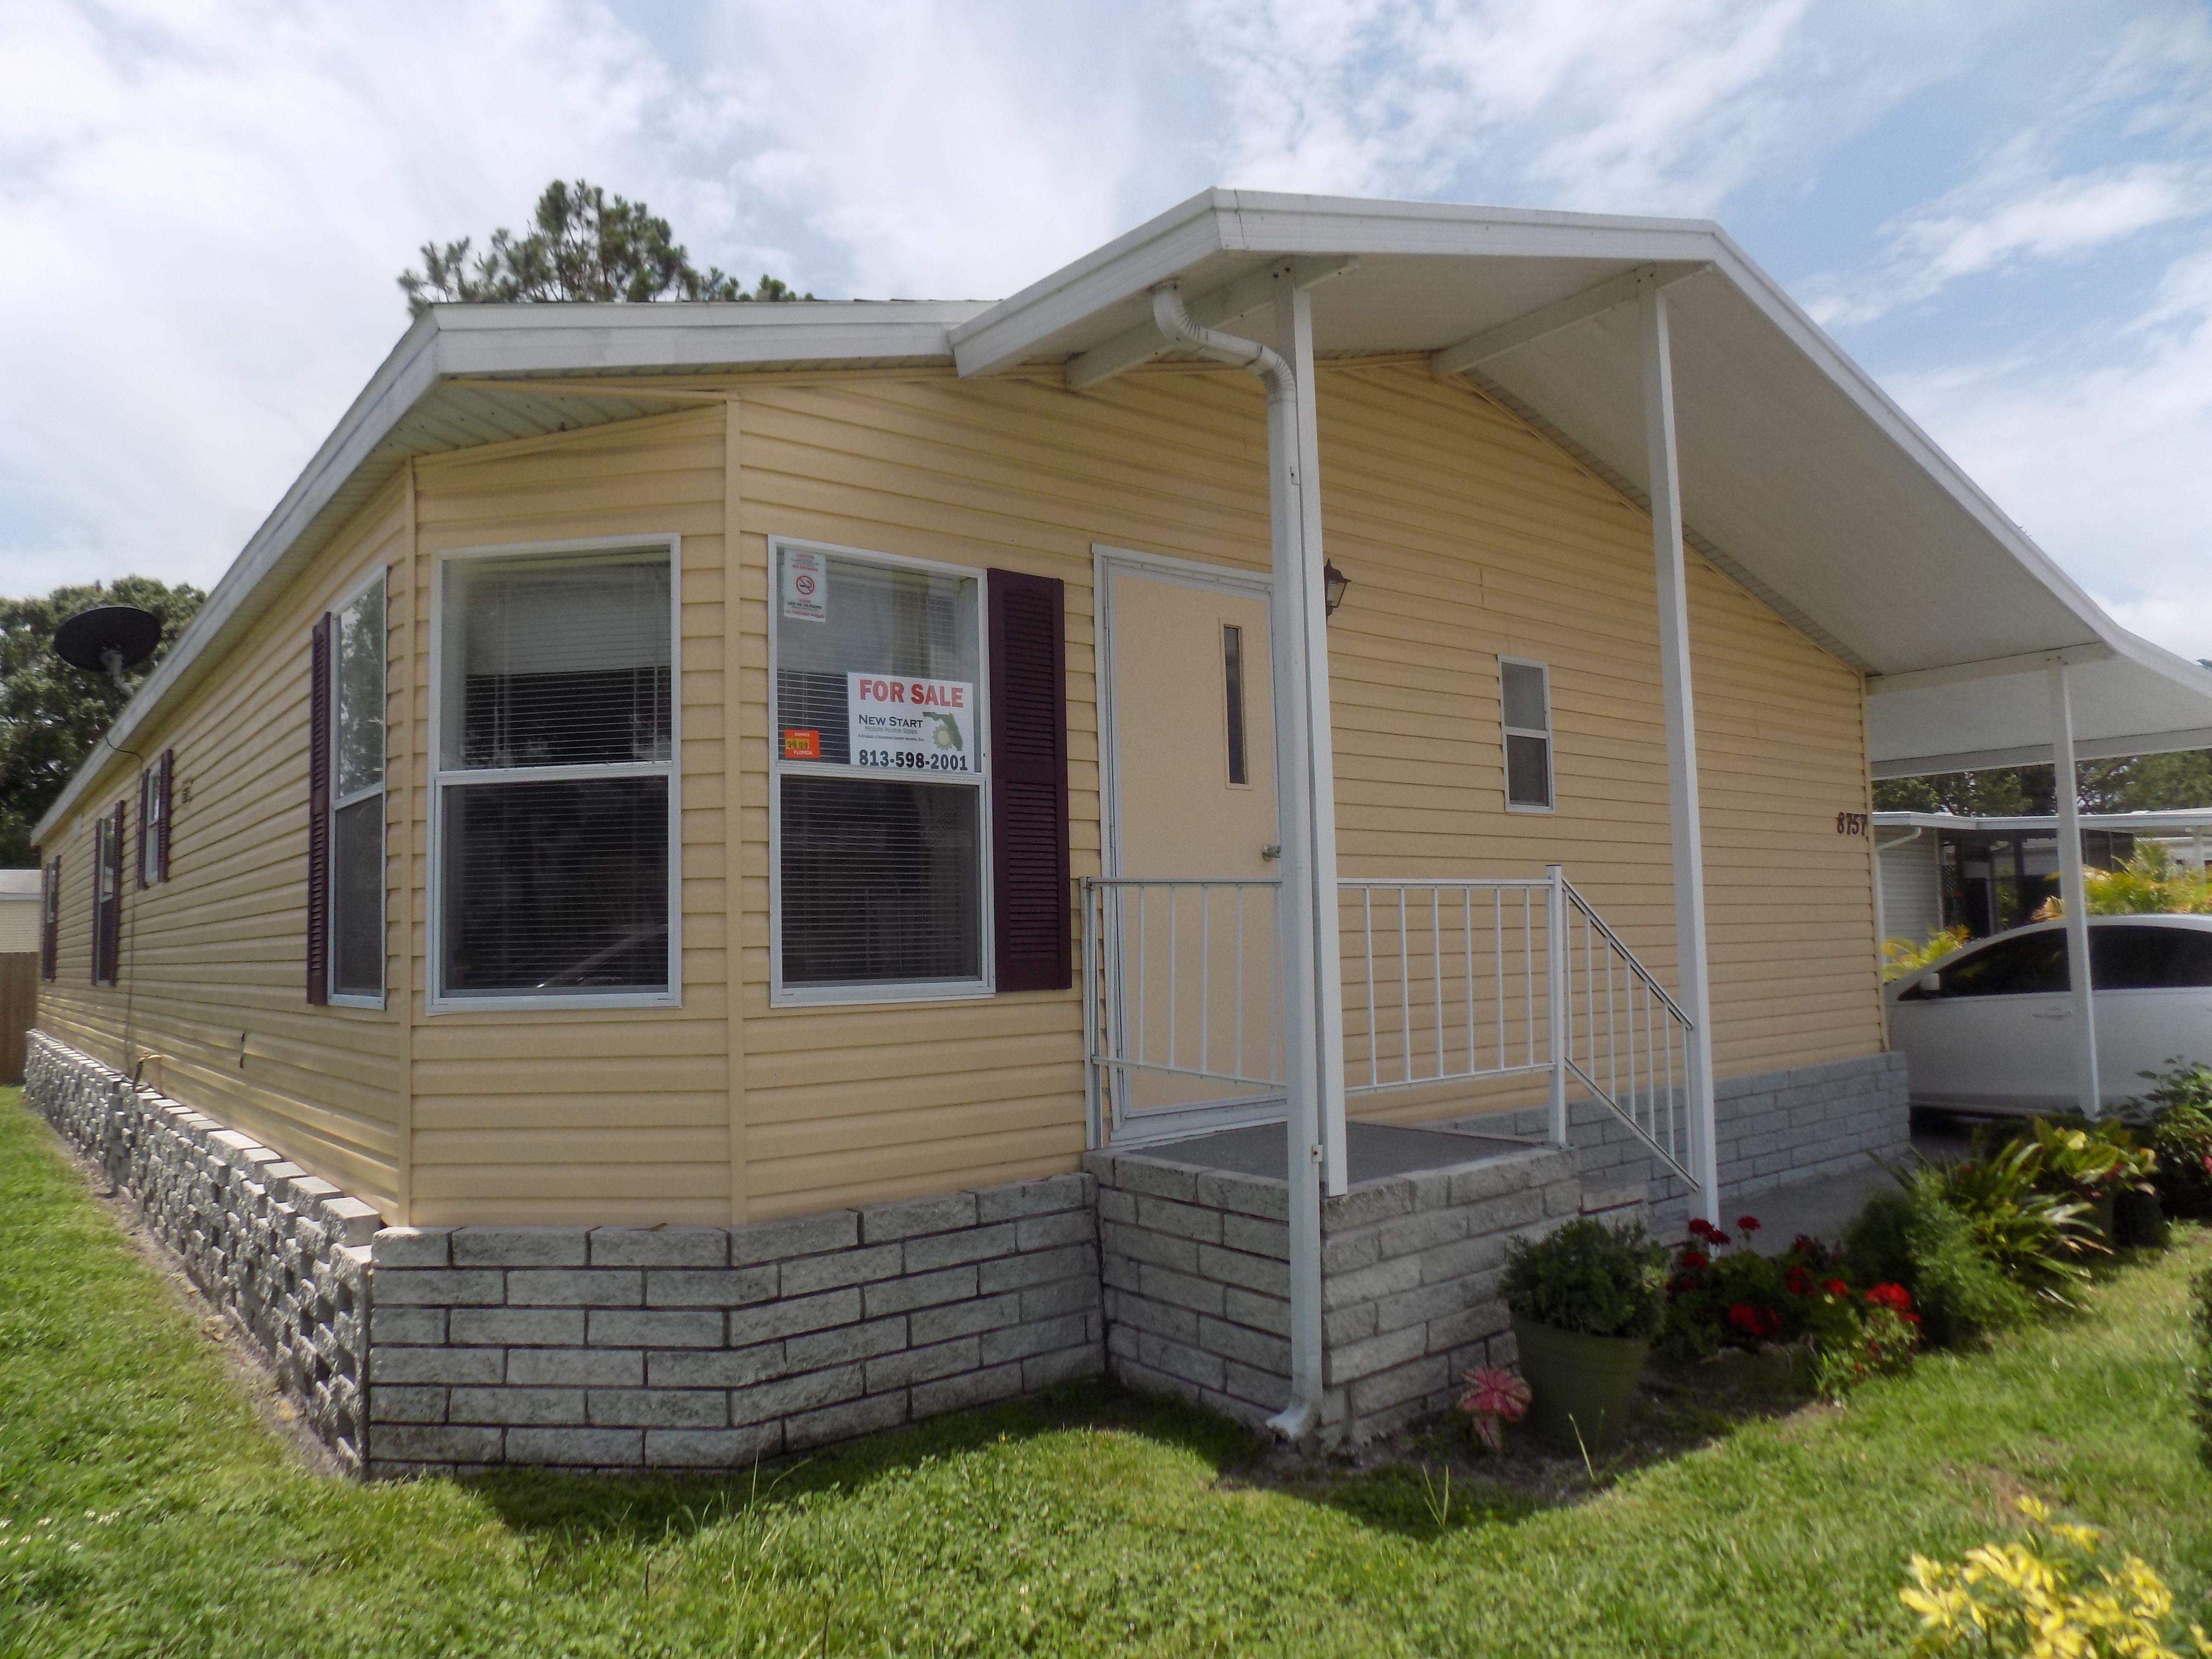 1996 Mobile / Manufactured Home in Tampa, FL via MHVillage